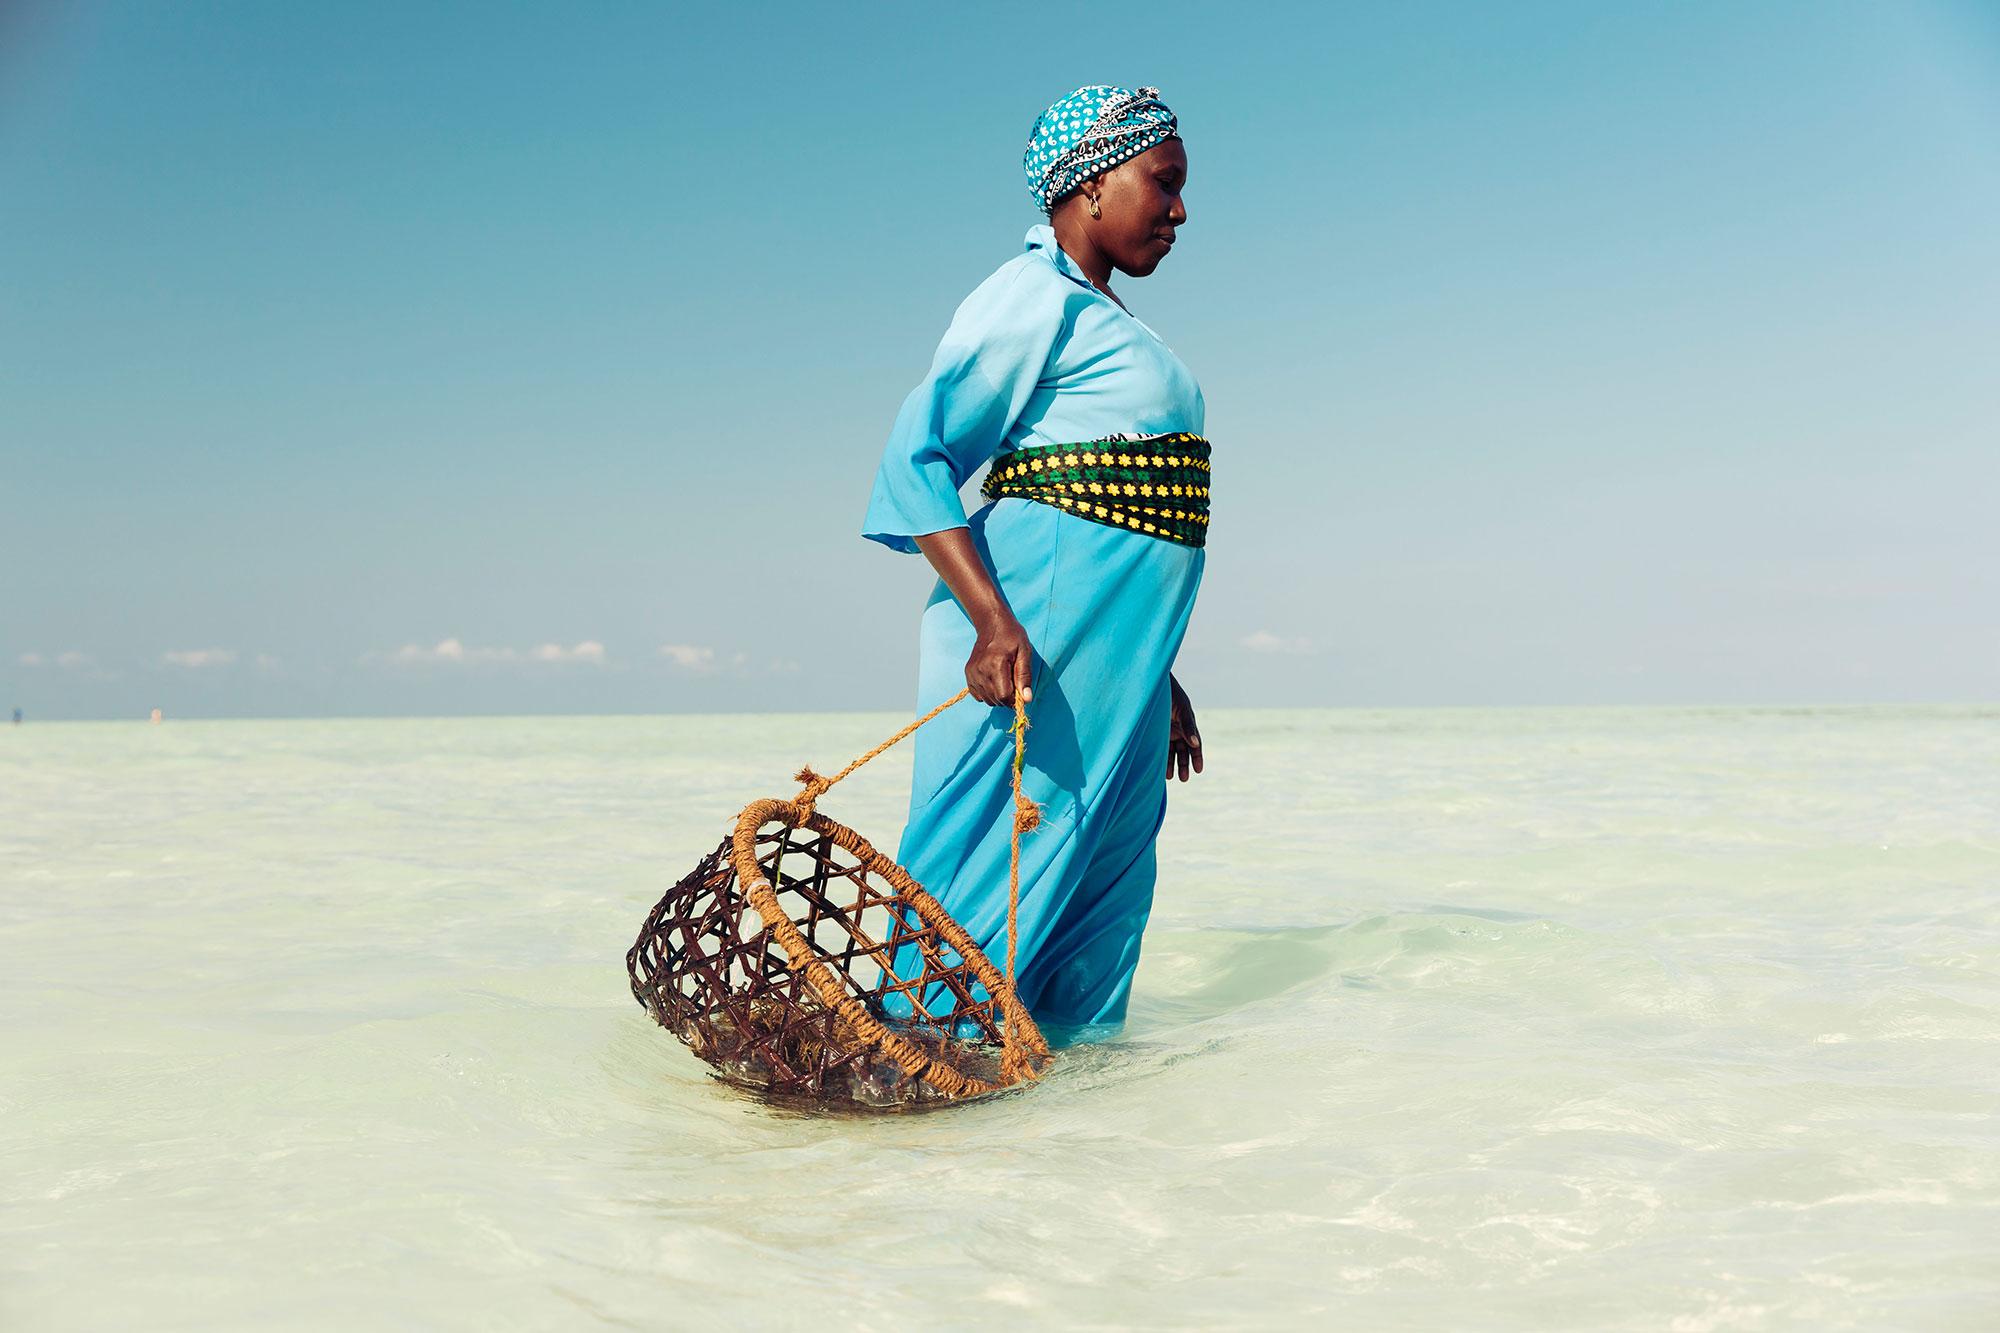 APitts_Condor_Zanzibar_126-2.jpg